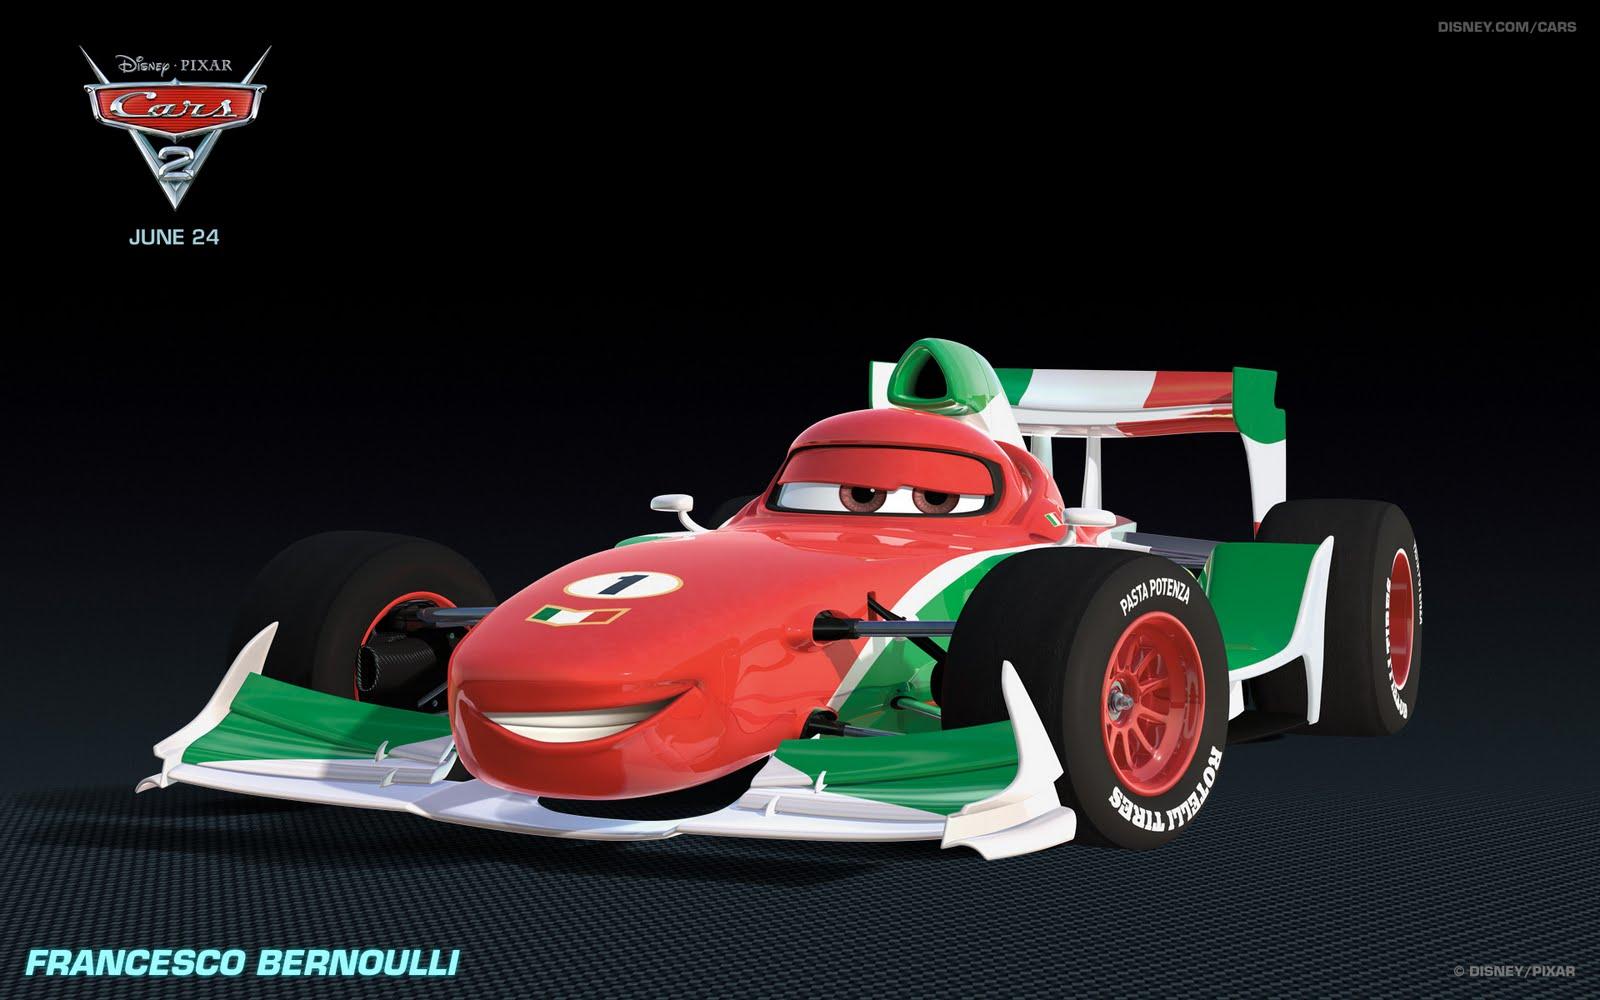 Disney Cars 2 Toys Disney Cars 2 Desktop Wallpaper